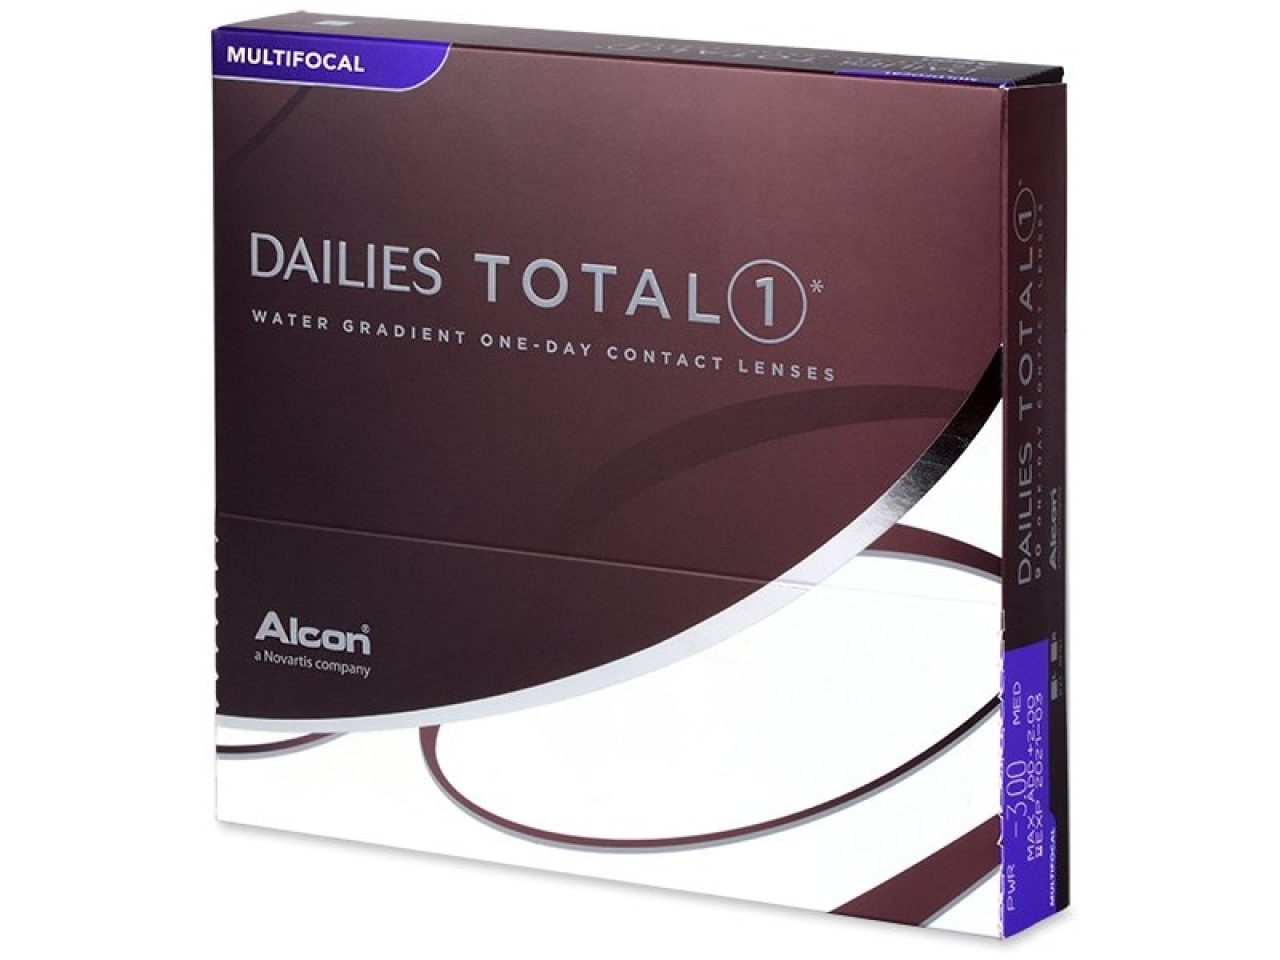 c26ea4d13 Alcon Pharmaceuticals Dailies Total 1 Multifocal 90ks od 93,89 ...